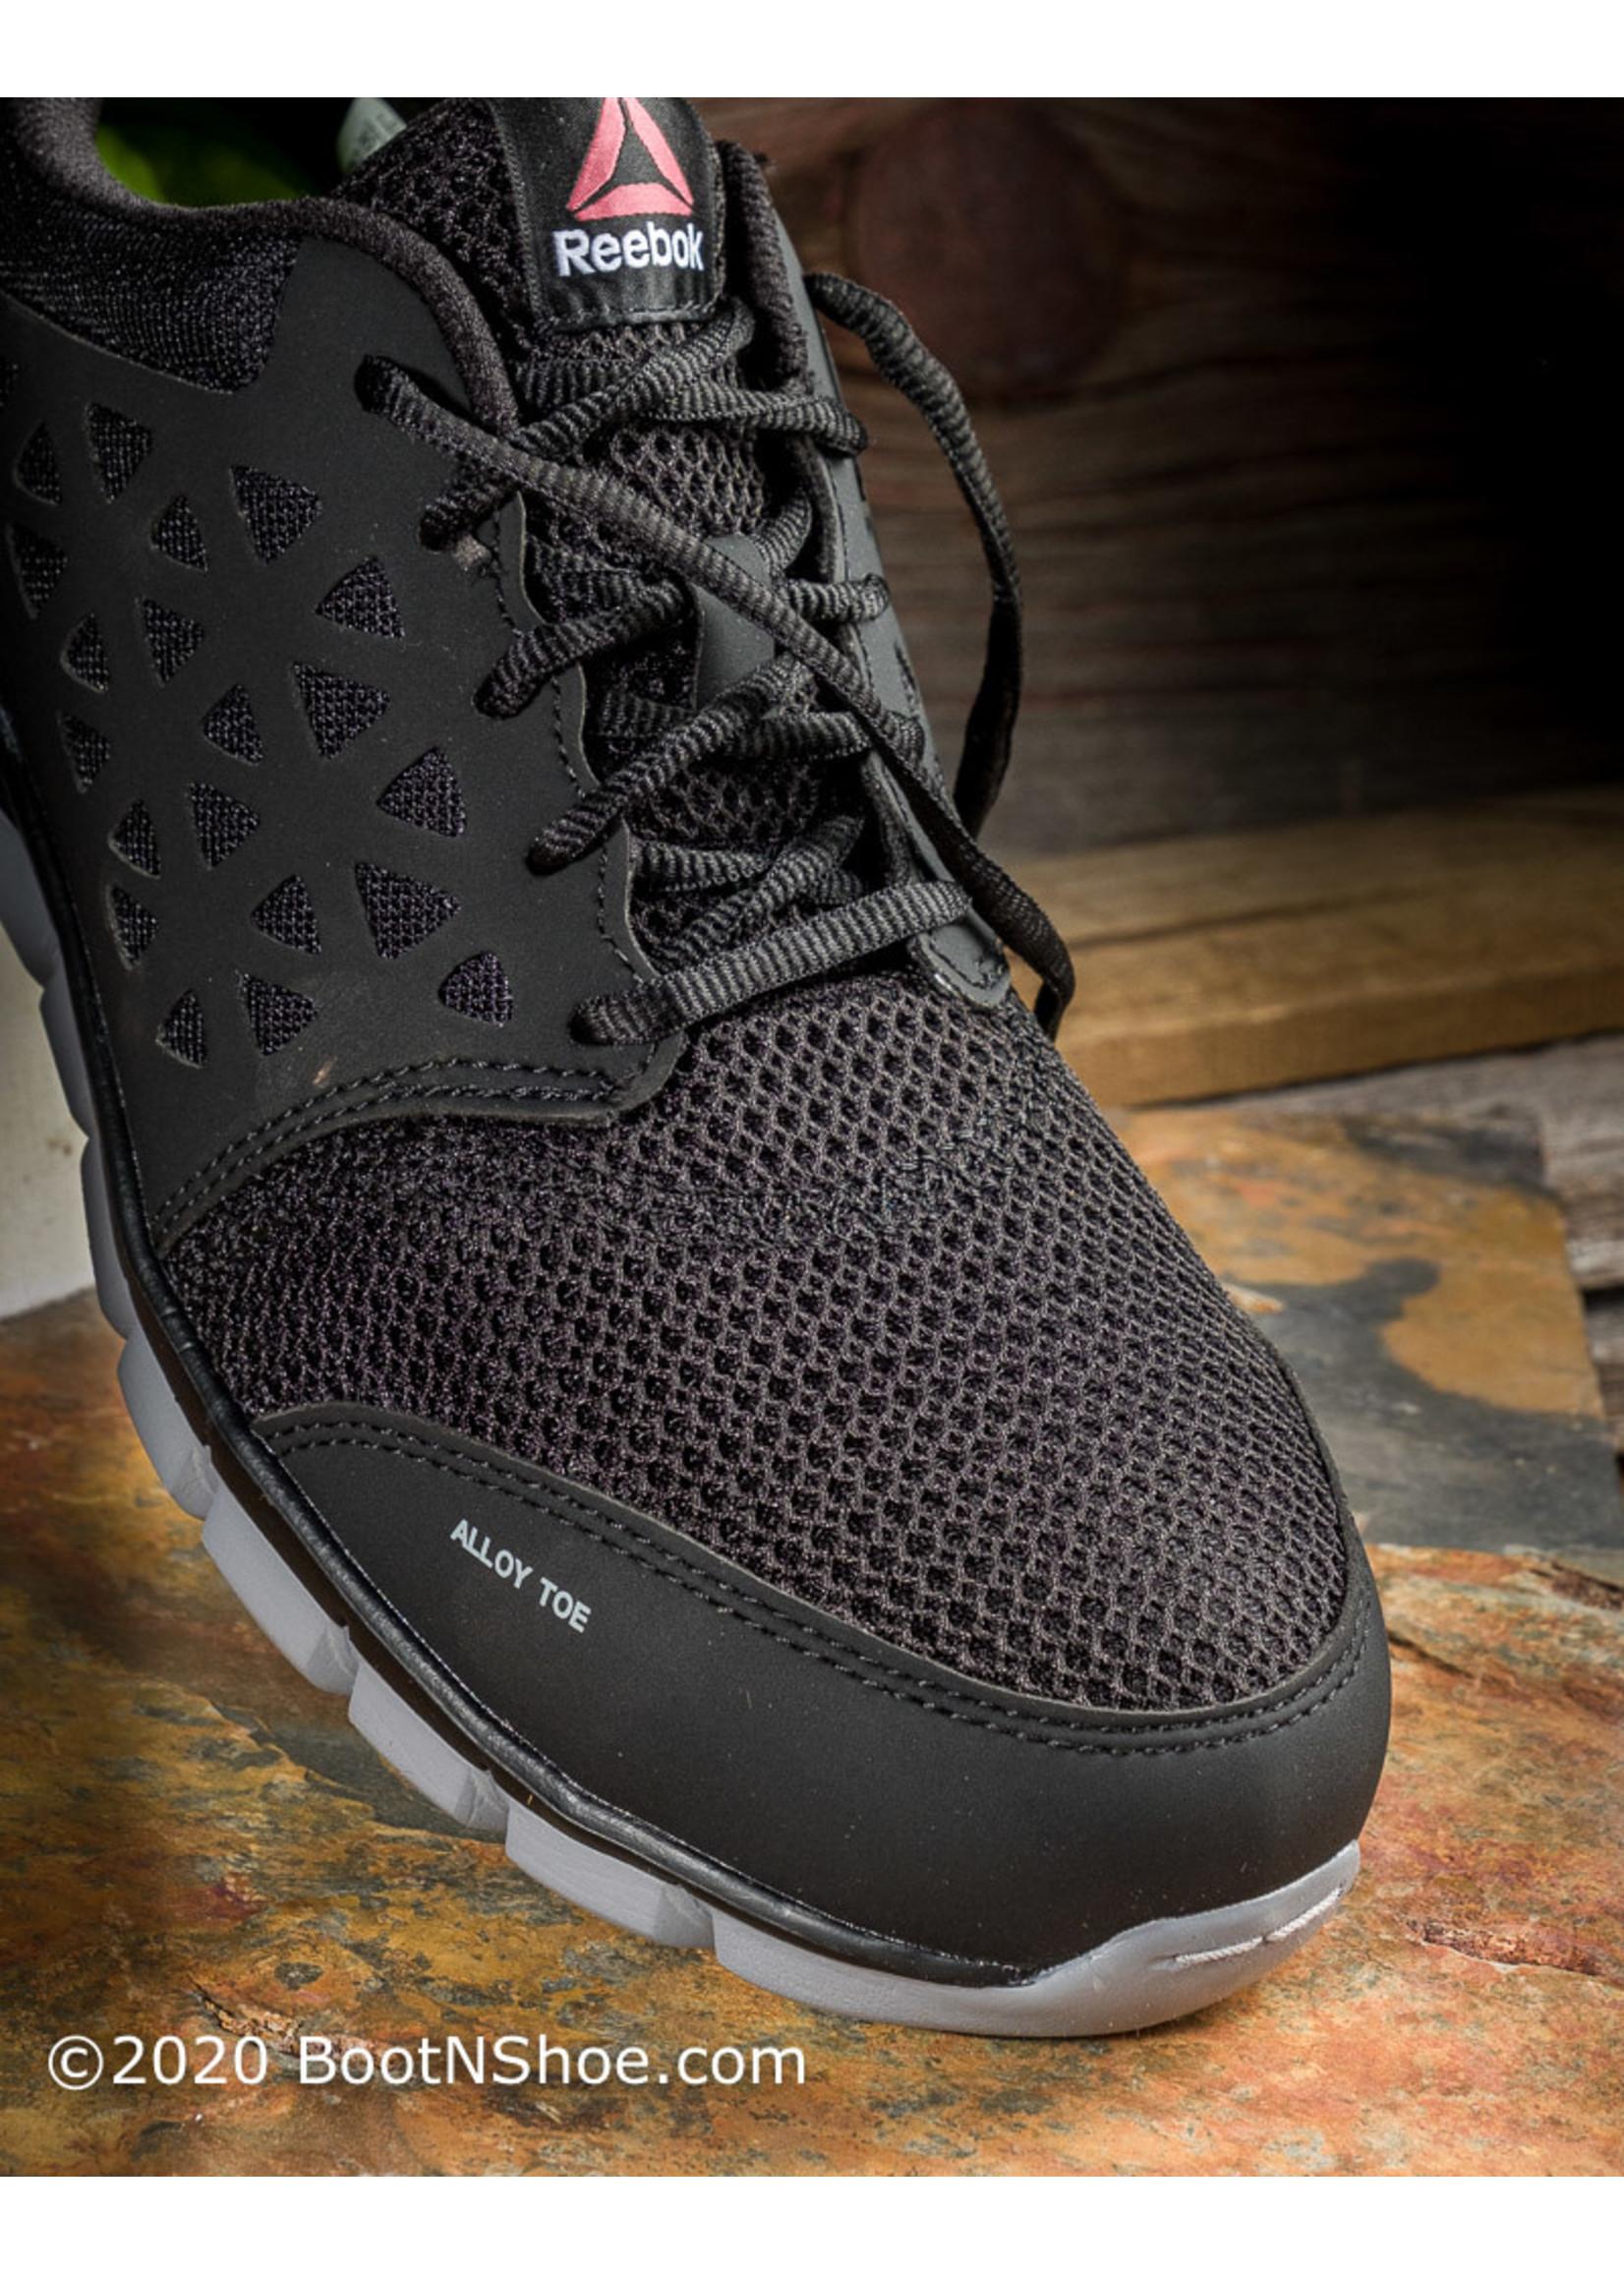 Reebok Men's Sublite Cushion Athletic  Alloy Work Shoe RB4041